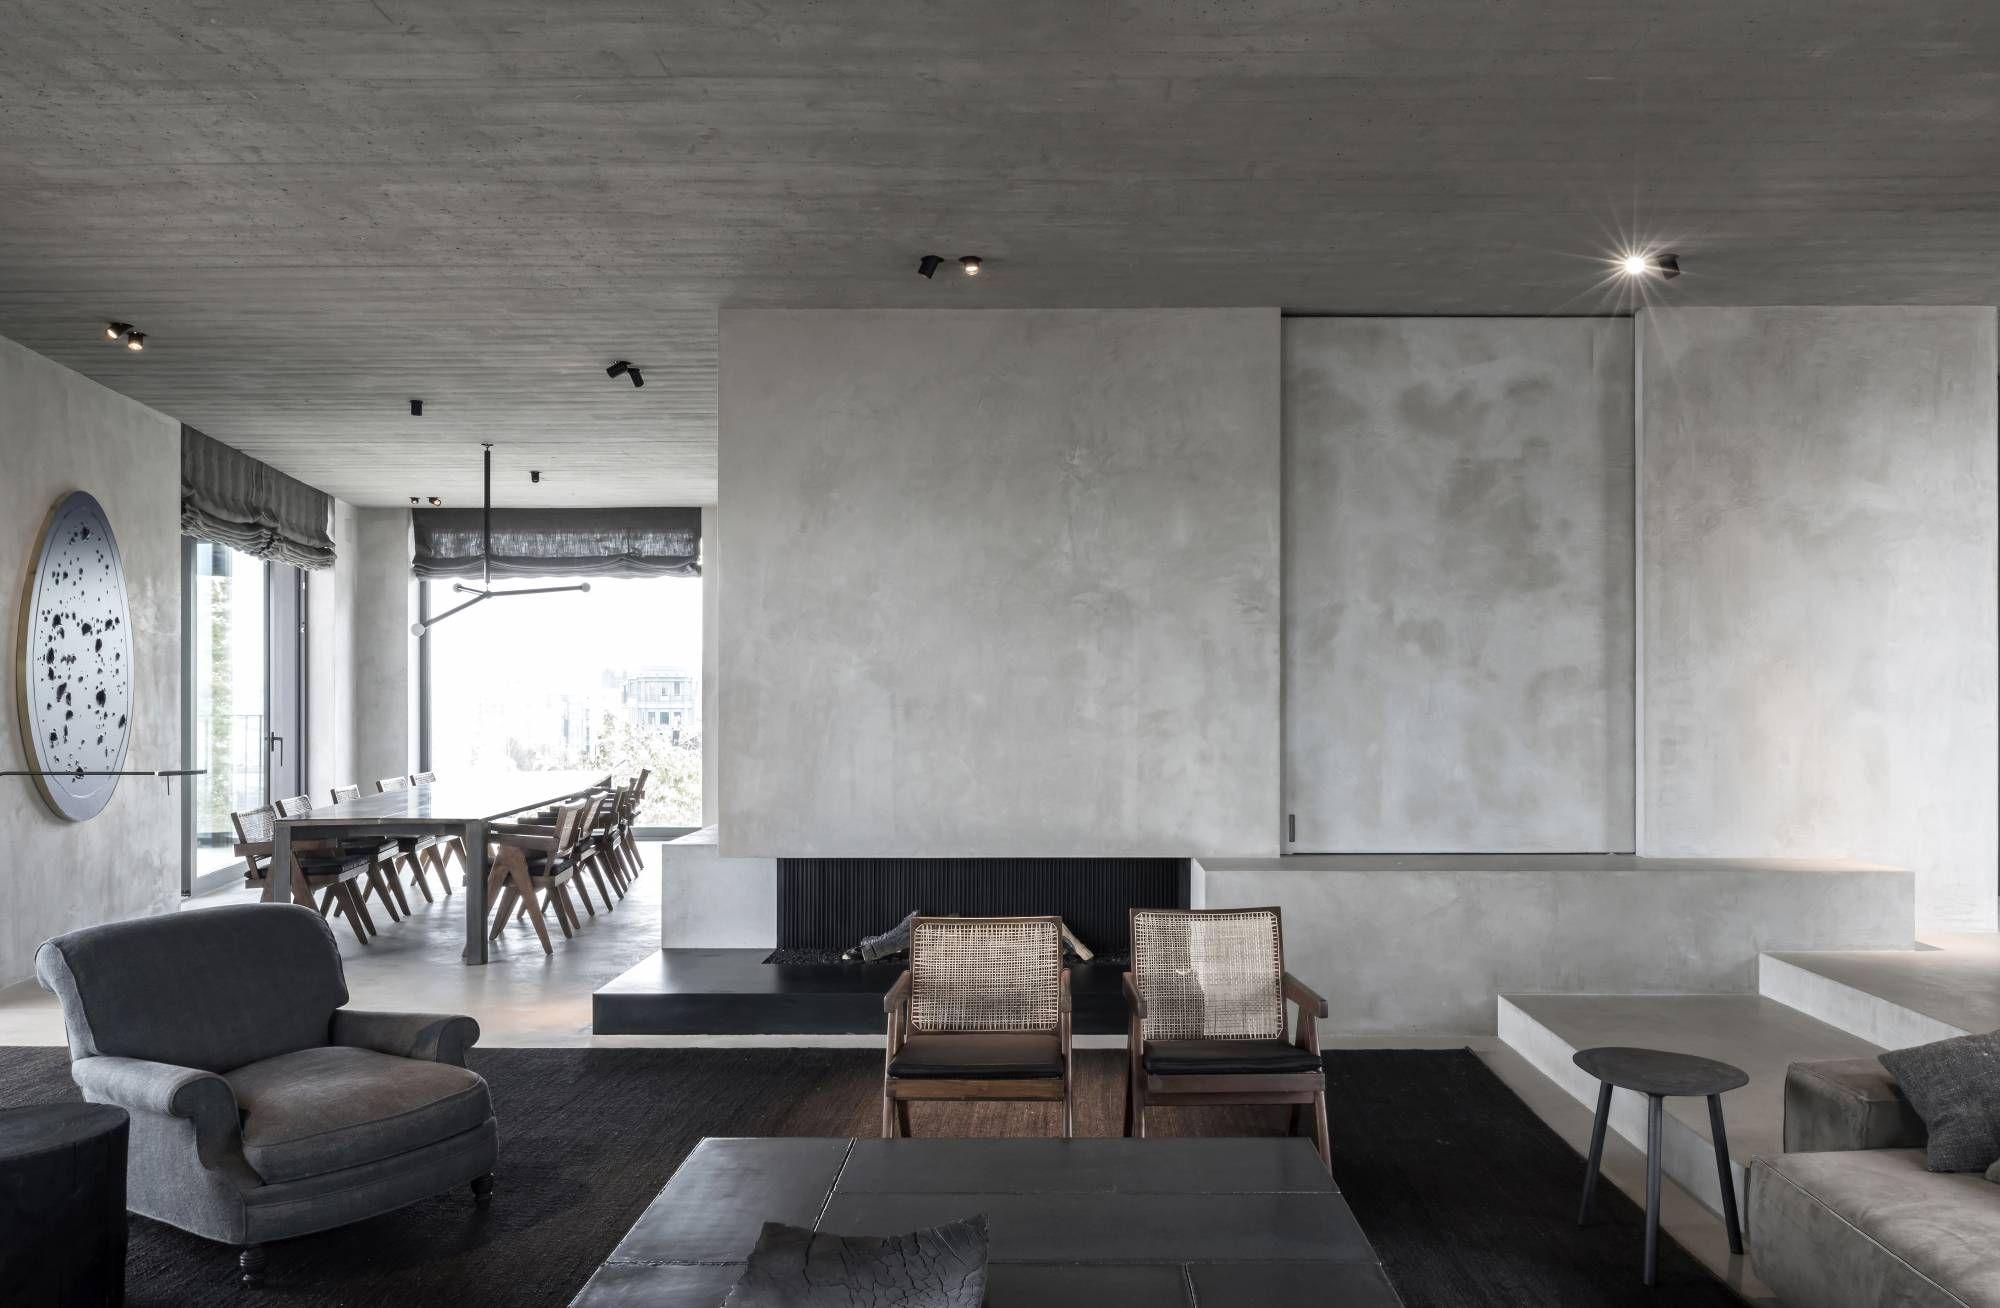 c penthouse betonw nde moderne einrichtung und moderne. Black Bedroom Furniture Sets. Home Design Ideas